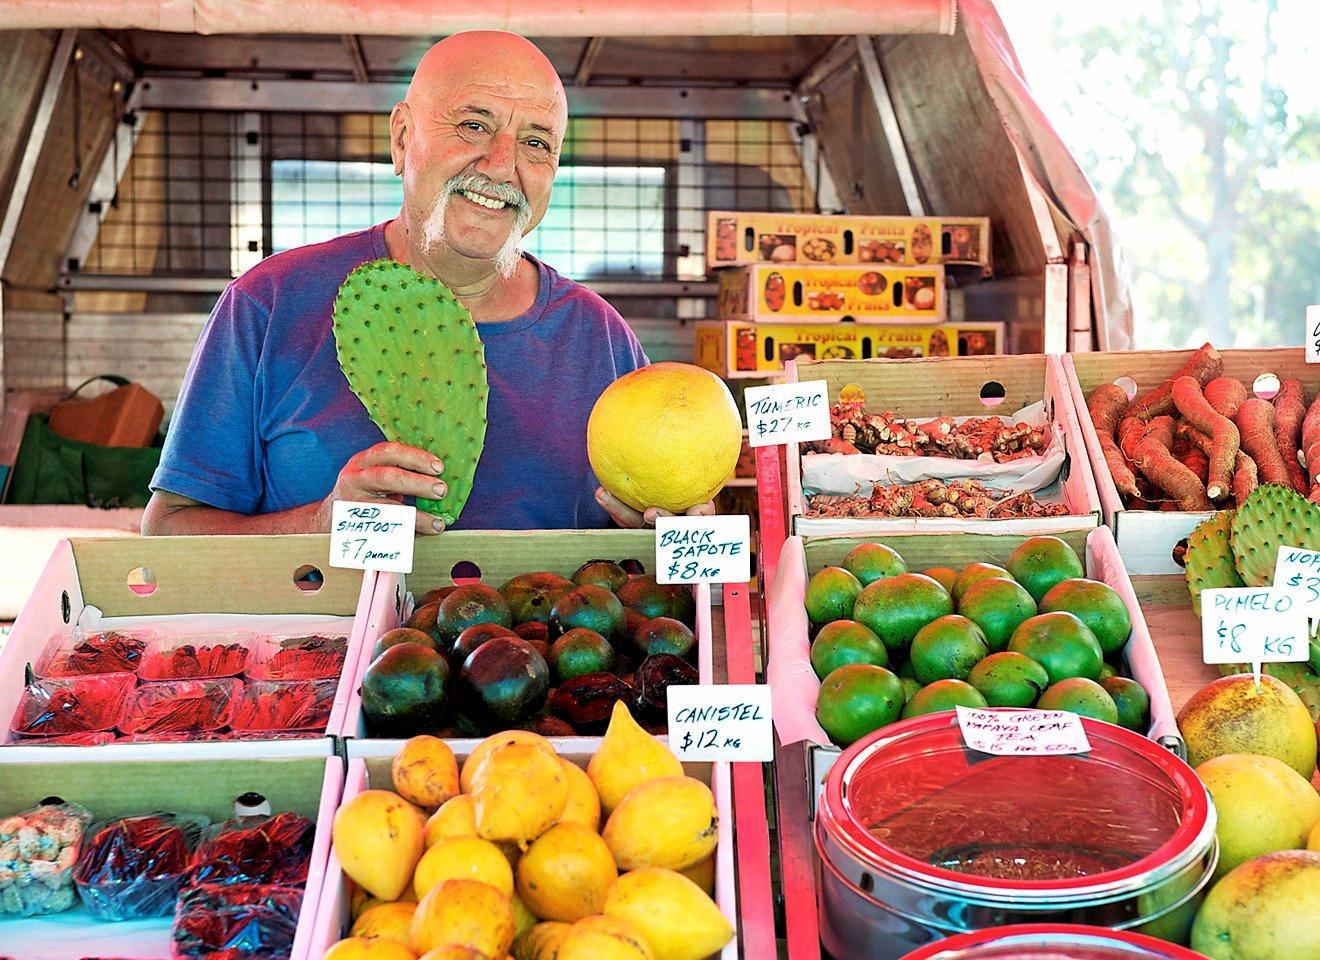 John Picone at his stall at the New Brighton Farmers' Market. PHOTO: KATE O'NEILL